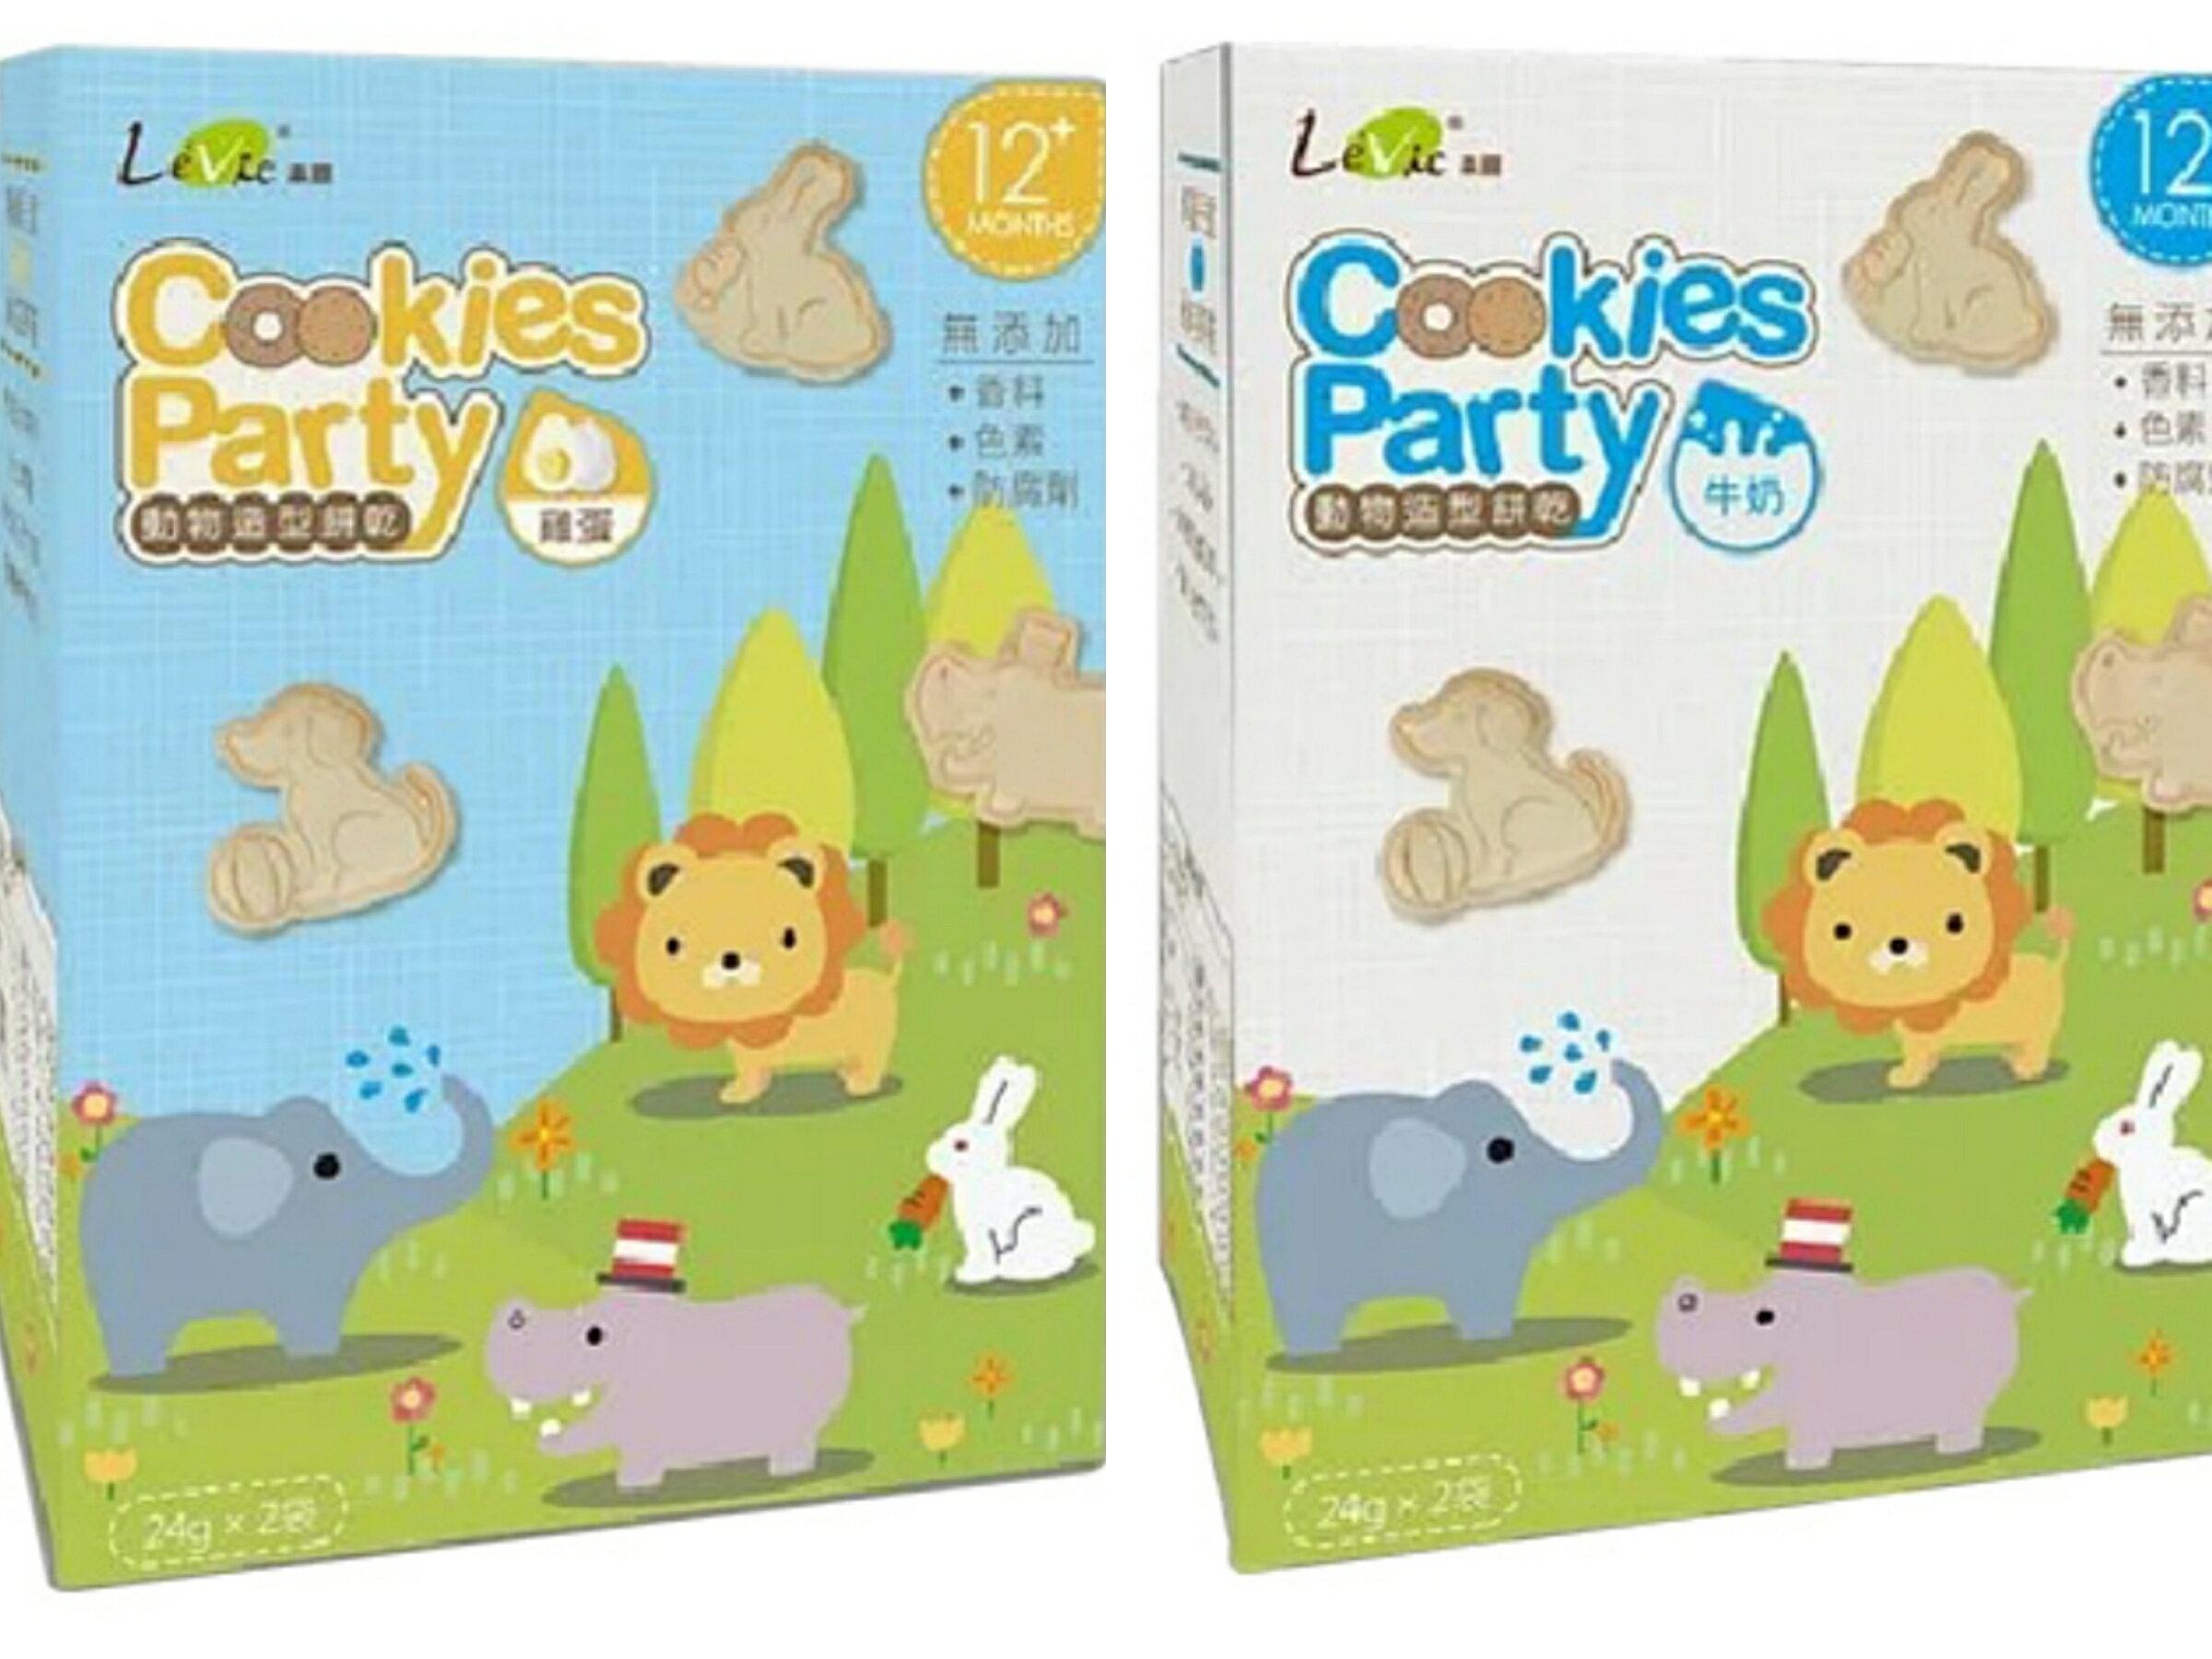 LeVic樂扉 Cookies Party- 動物造型餅乾/寶寶米餅 [FIFI SHOP]